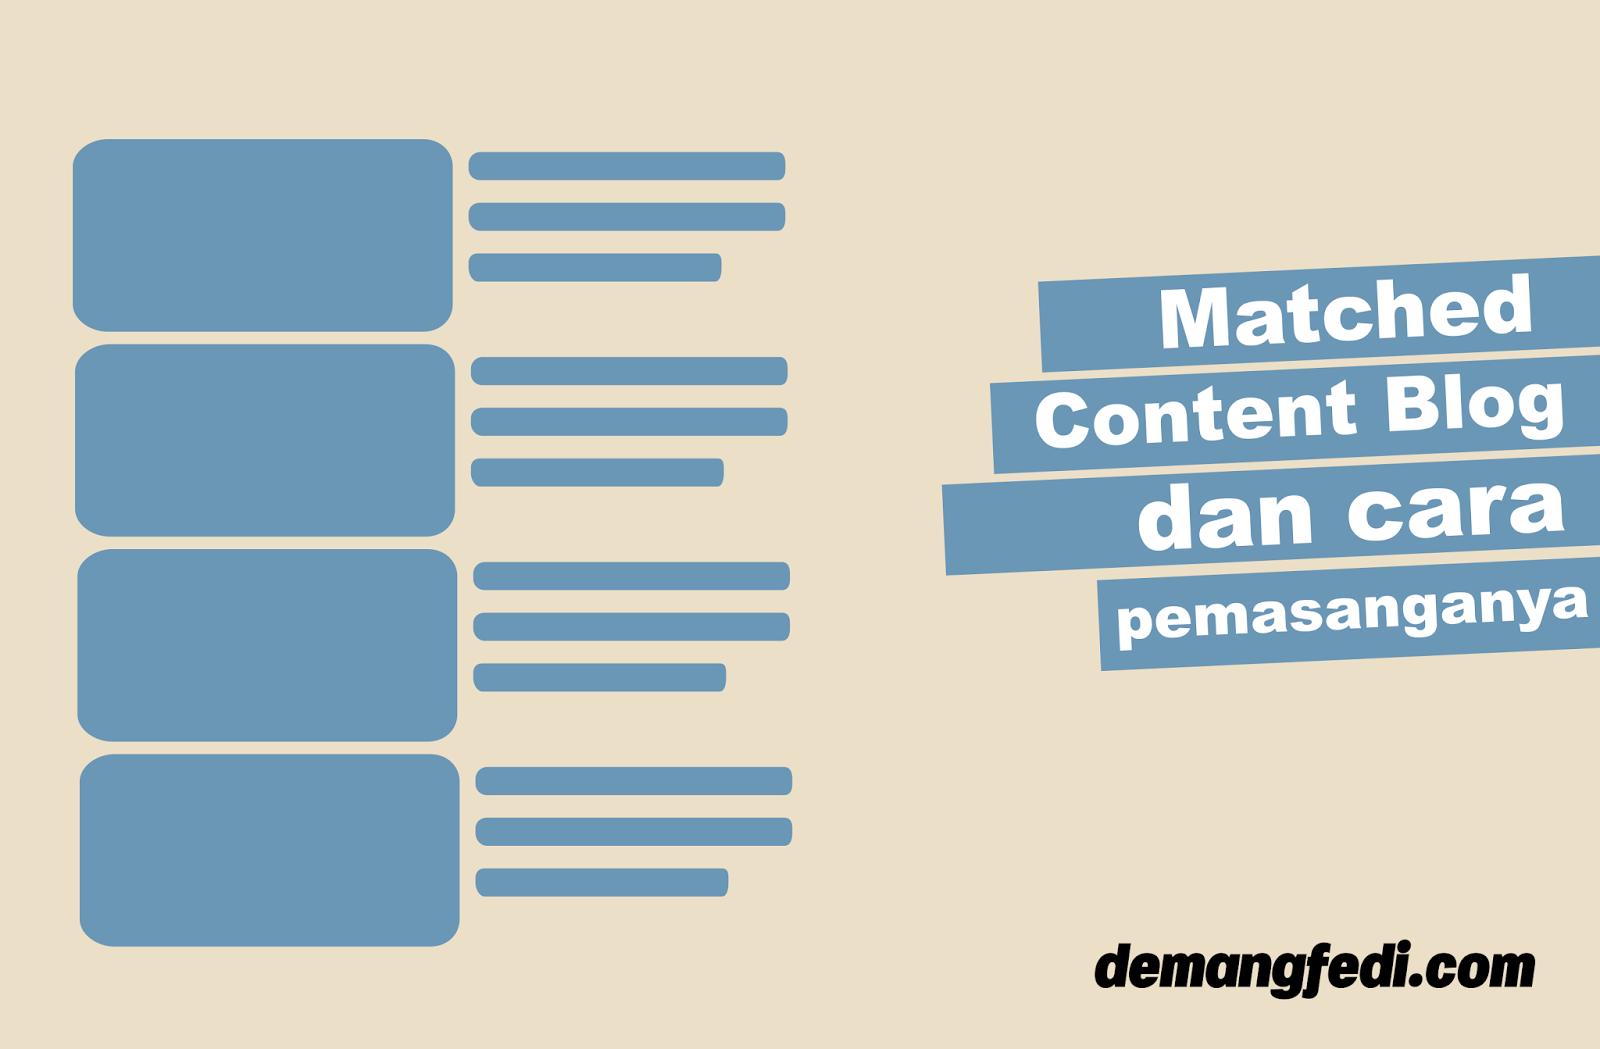 Cara Mendapatkan Dan Memasang Related Post Matched Content Blogspot